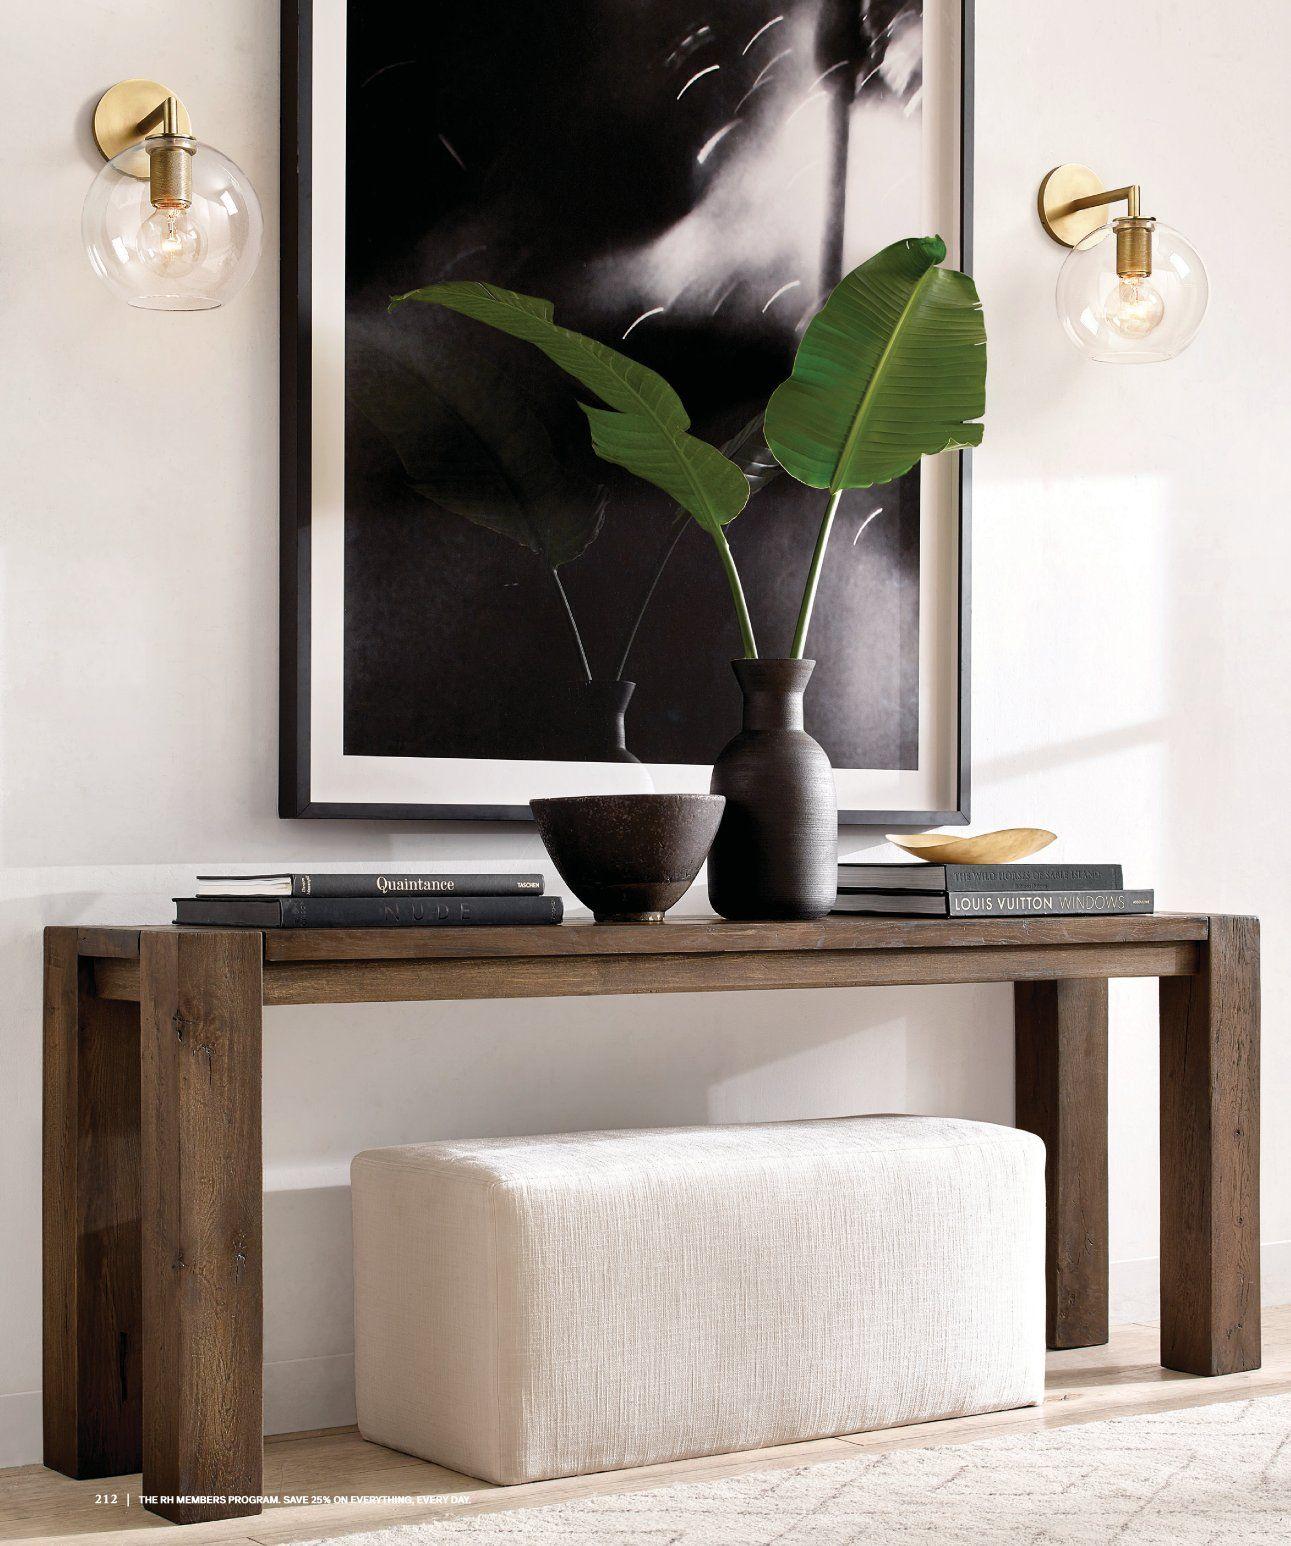 Rh source books catalog projects house design interior home also decor pinterest